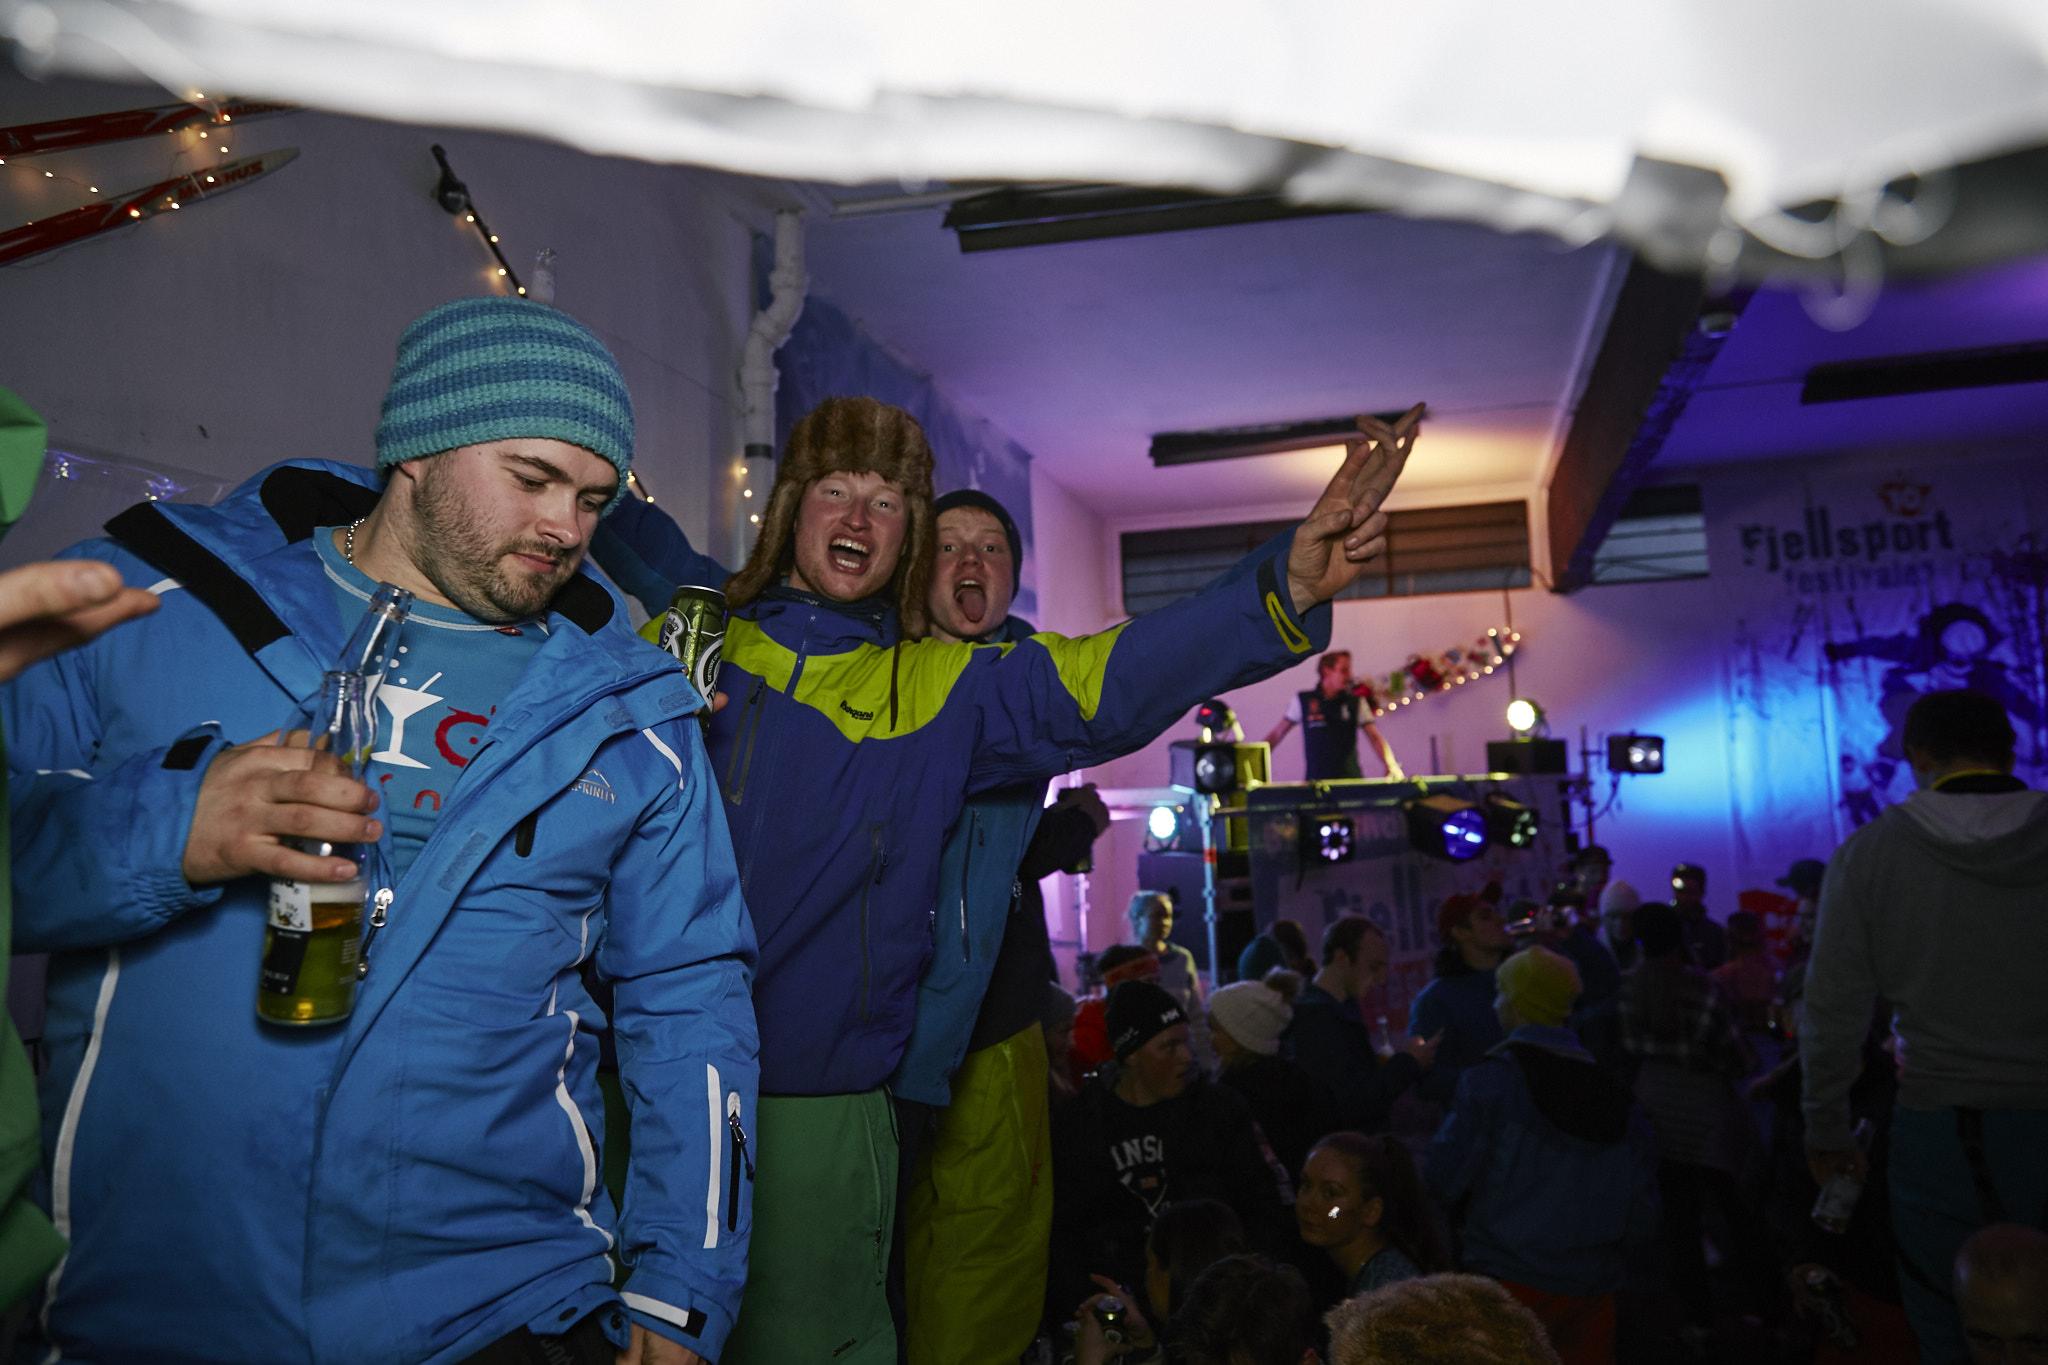 2018.02.22-Fjellsportfestival-Afterski-008.jpg